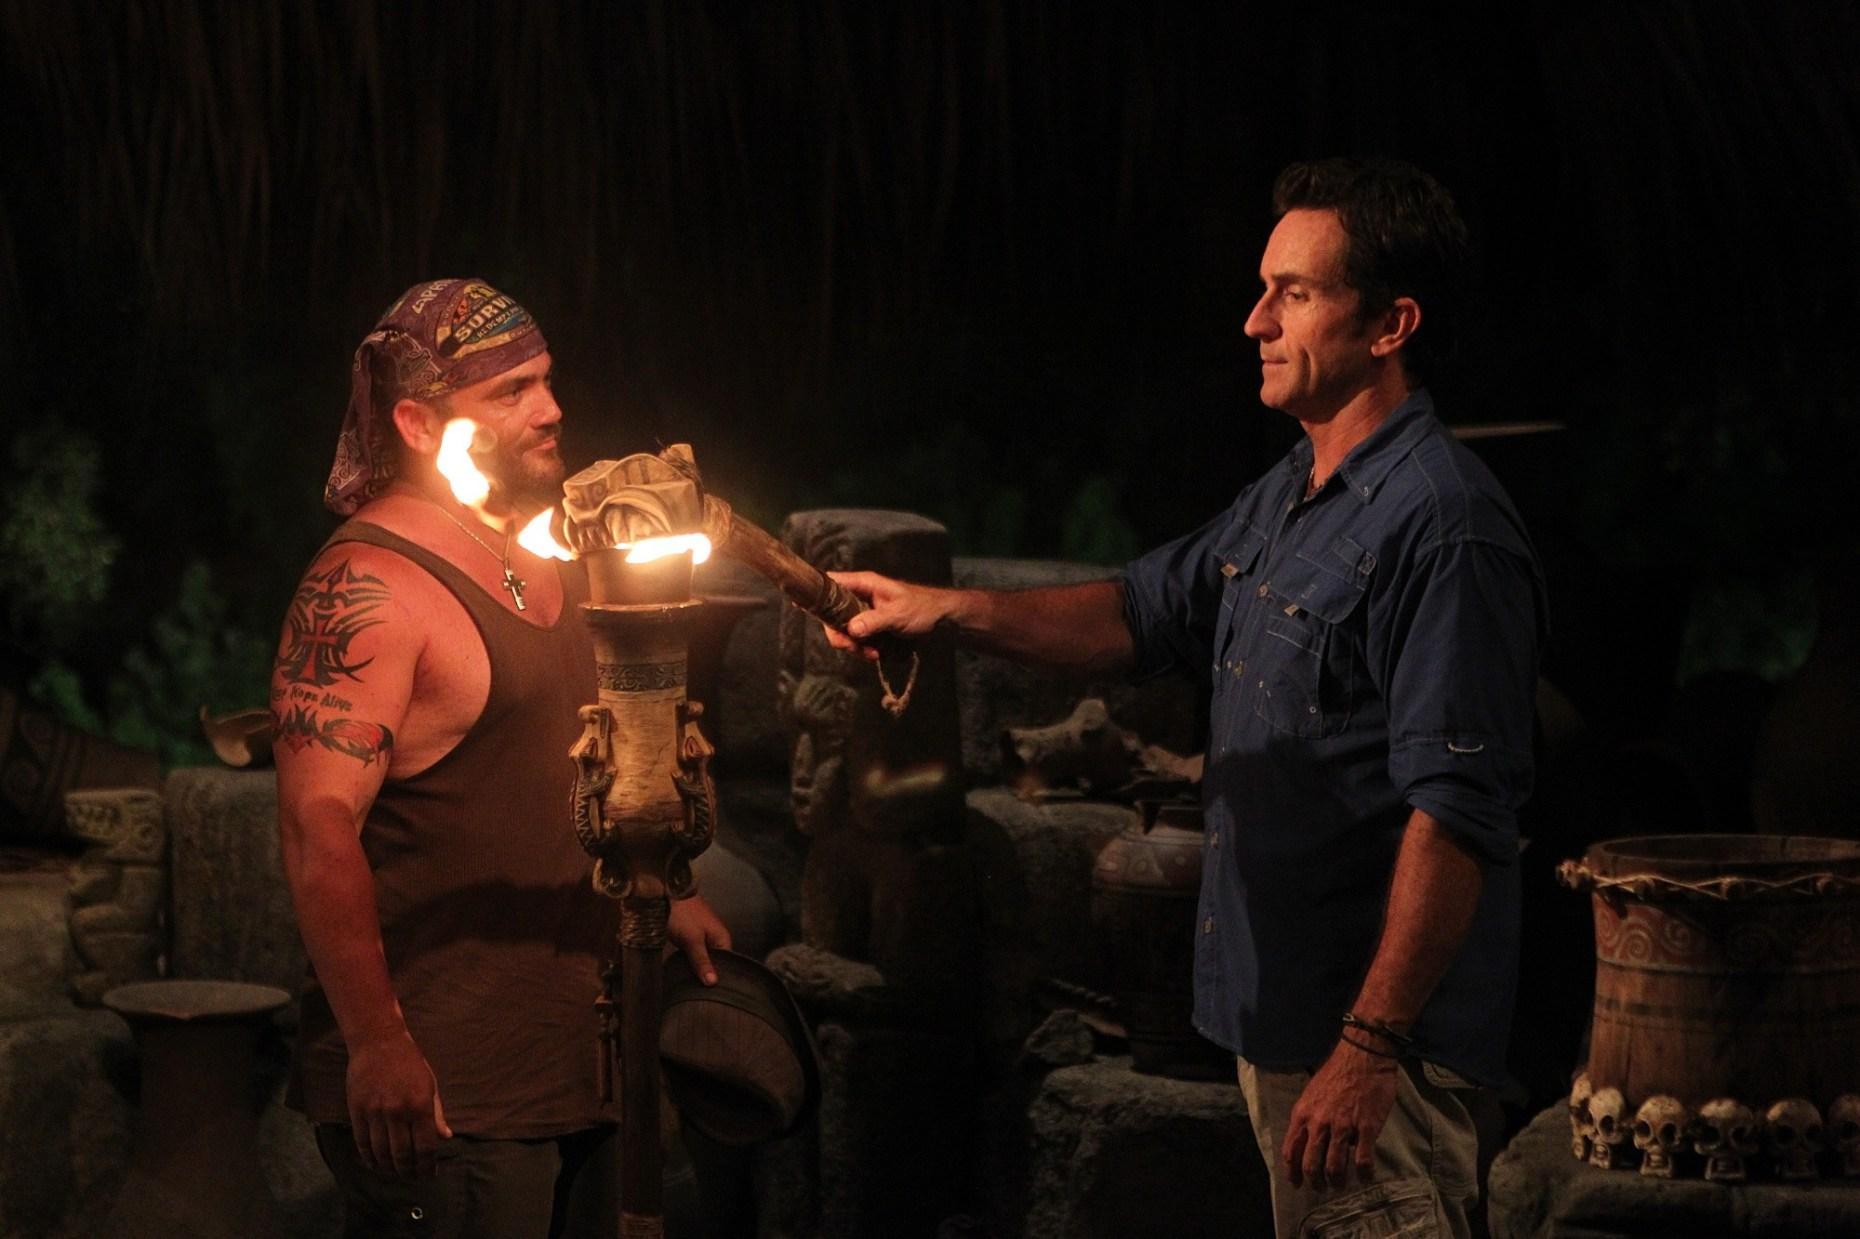 Russell Hantz and Jeff Probst of Survivor